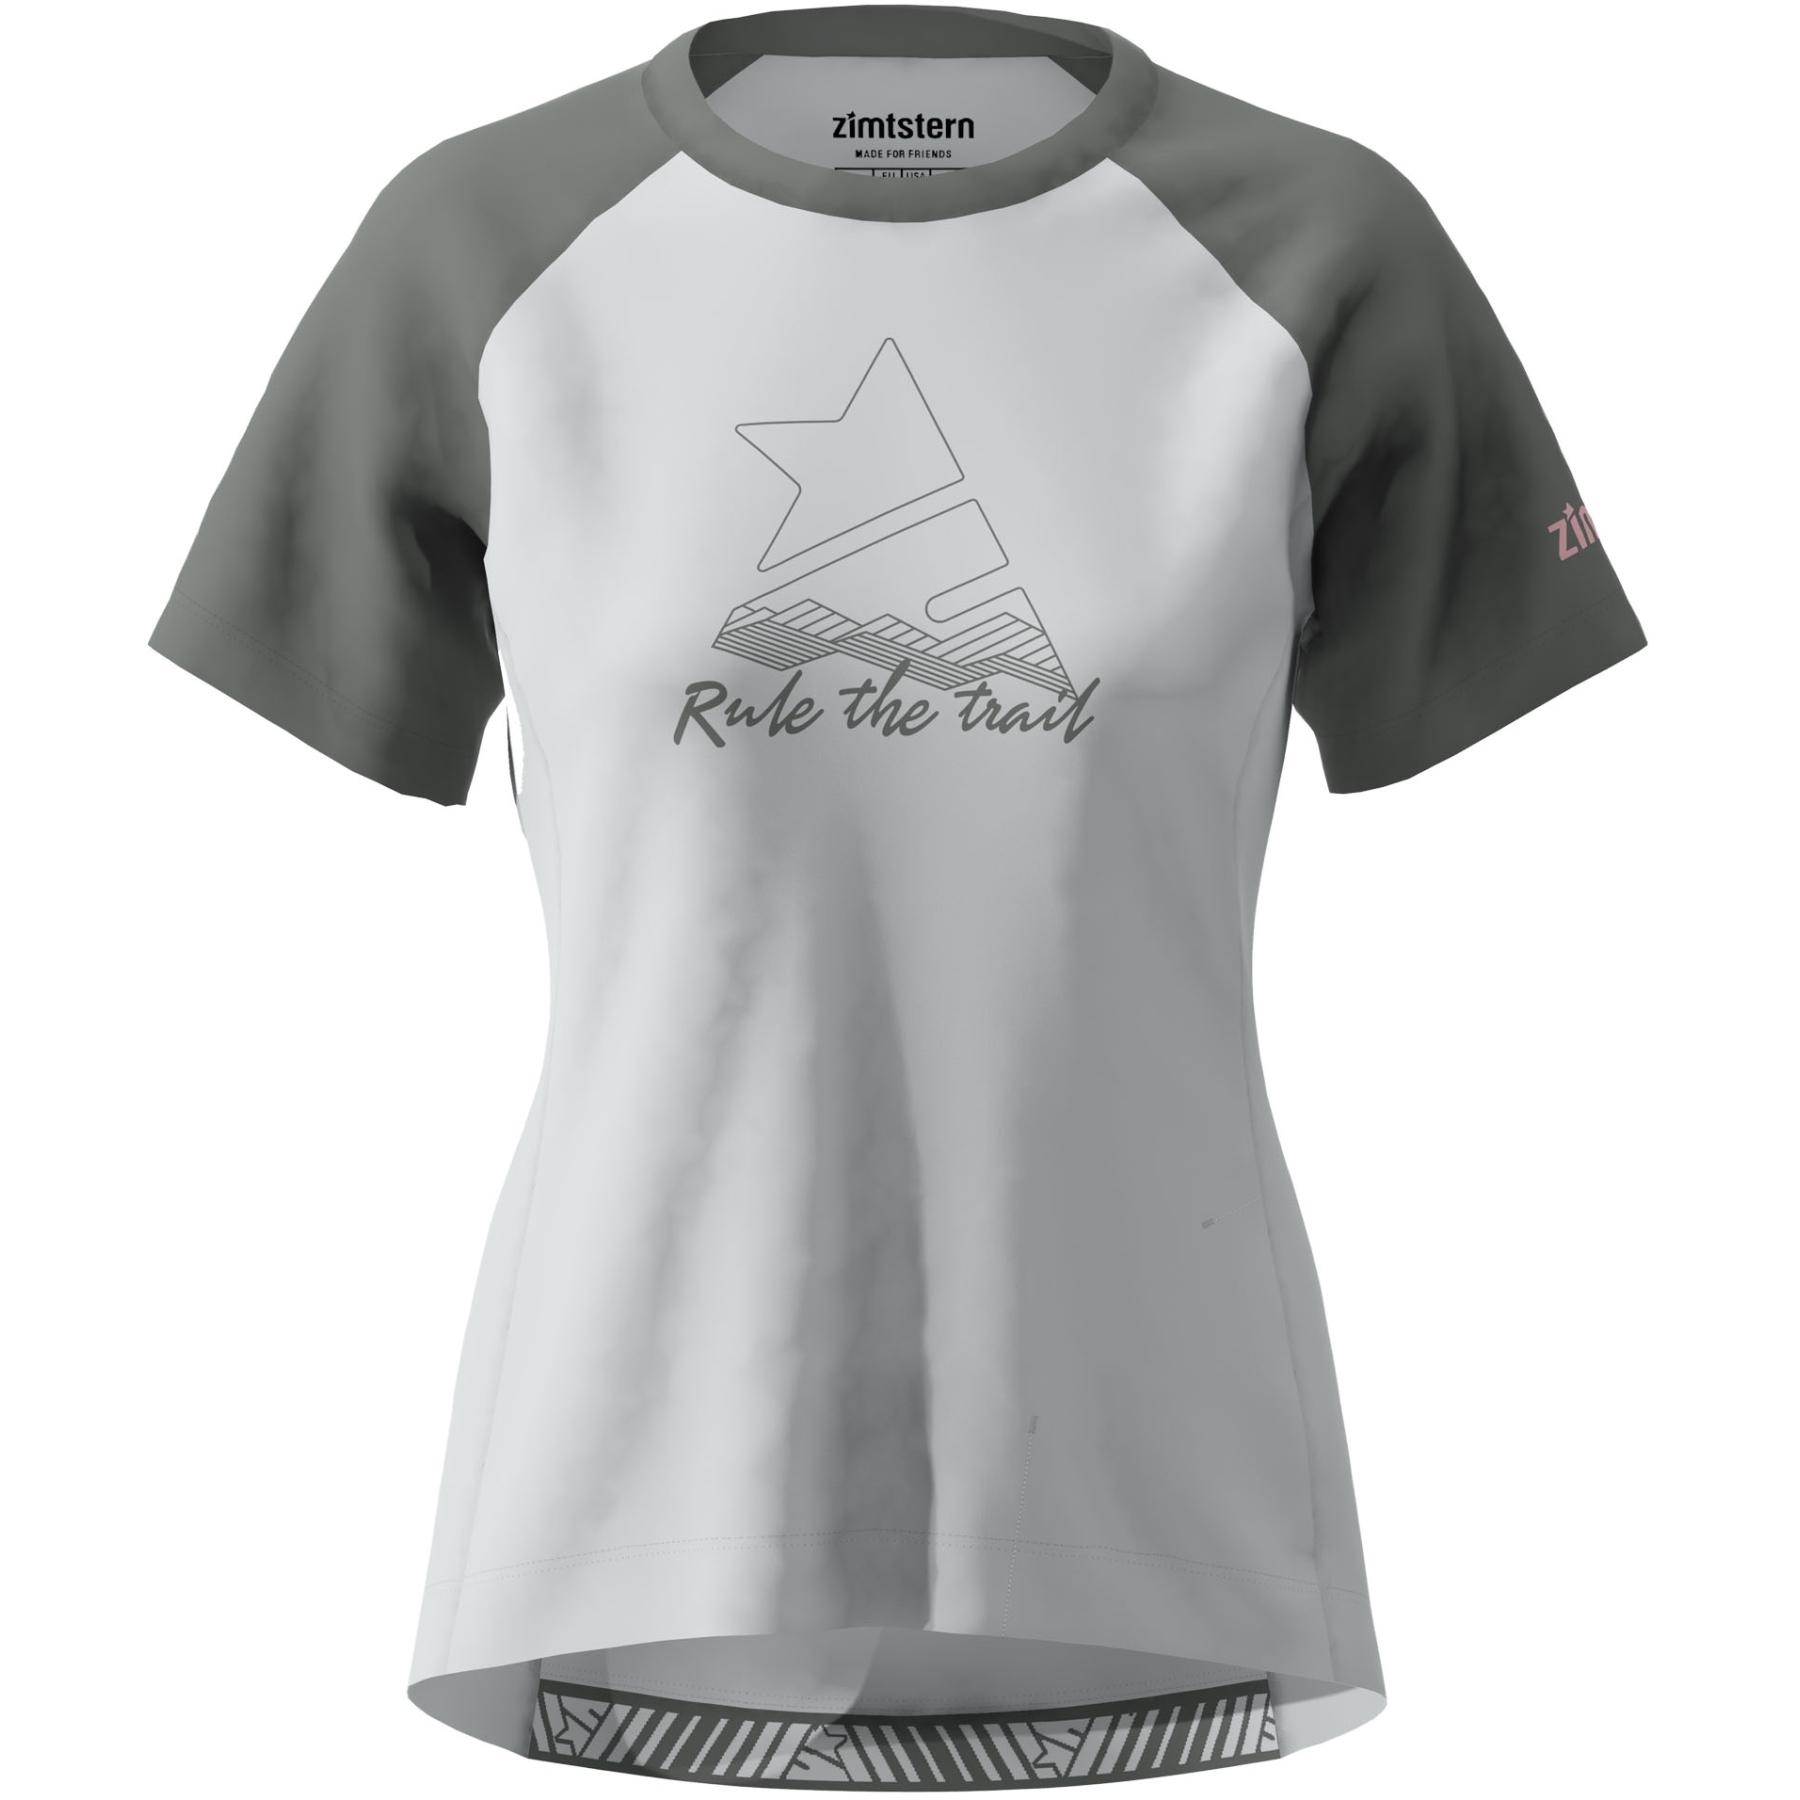 Zimtstern PureFlowz Kurzarm-Shirt Damen - glacier grey/gun metal